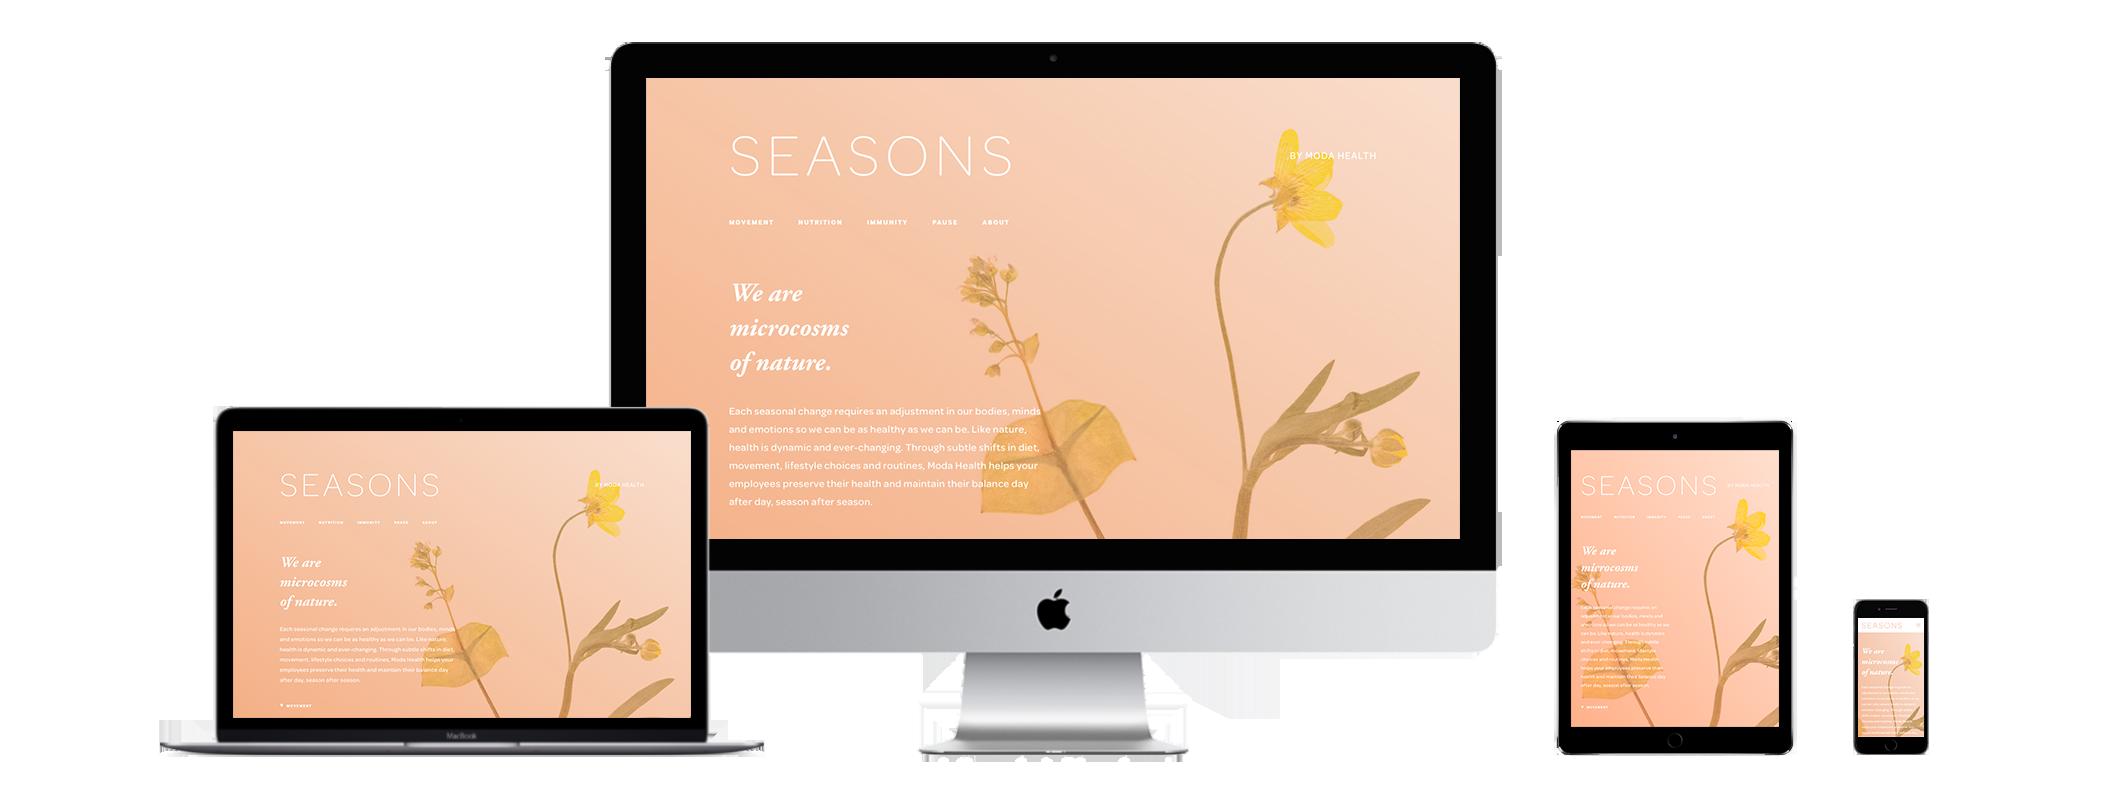 XYZ Design | Seasons Website Device Displays